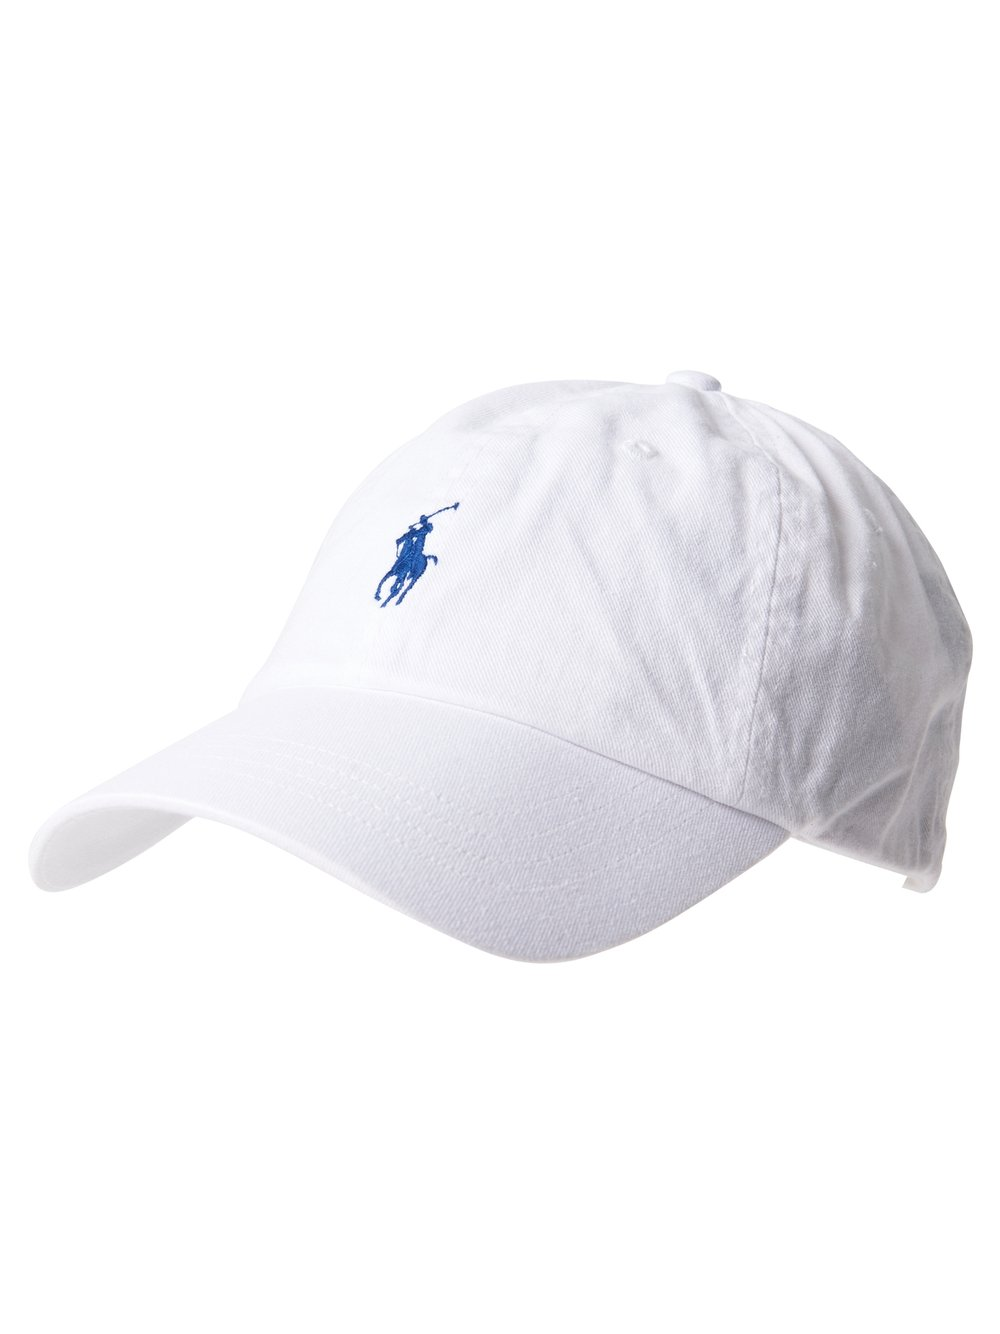 4be1cc29620d Polo Ralph Lauren Herren Cap  2  online kaufen   PEEK-UND-CLOPPENBURG.DE